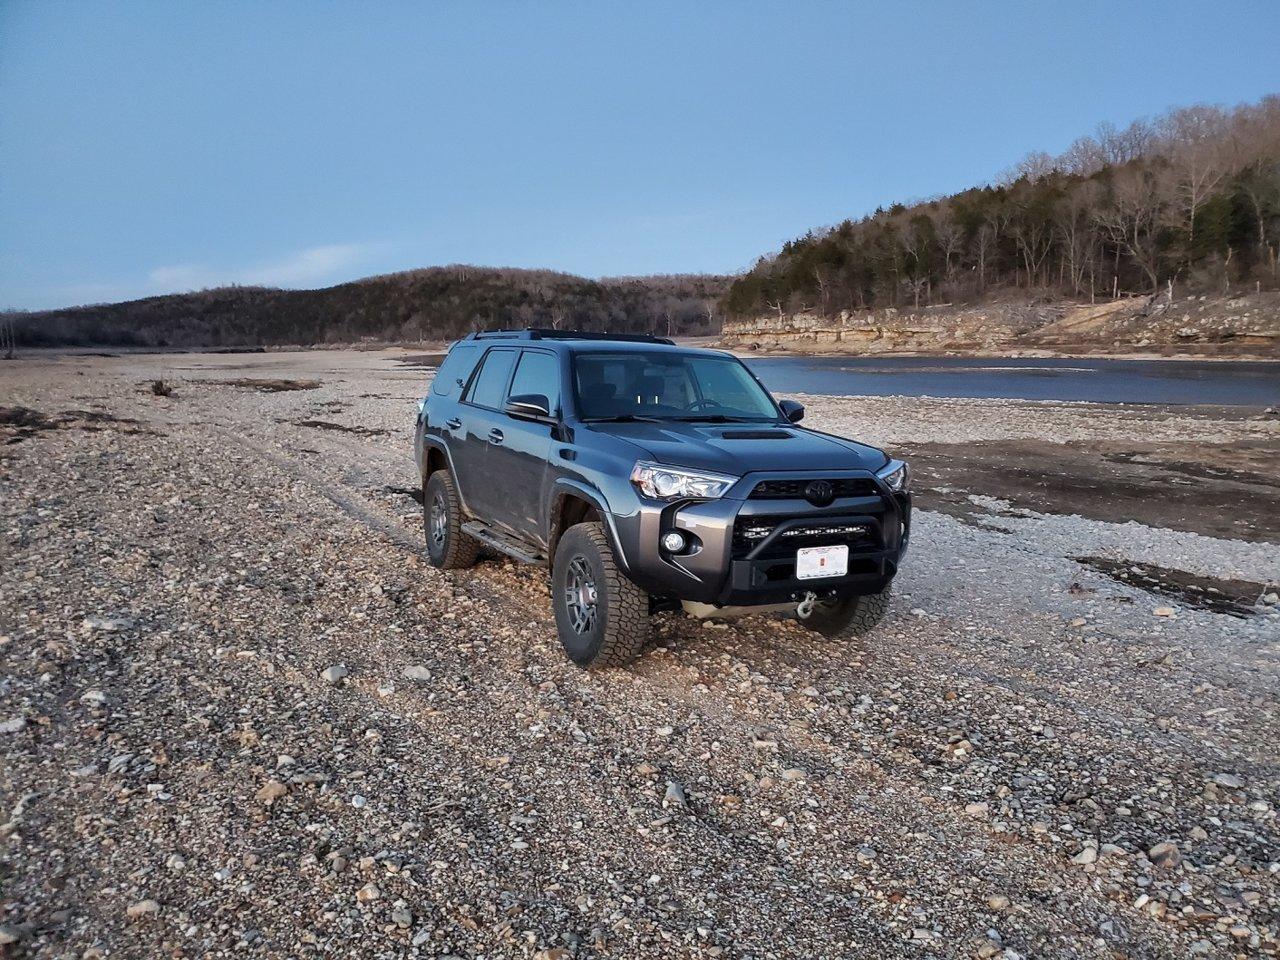 Bryant Creek Haskins Ford.jpg